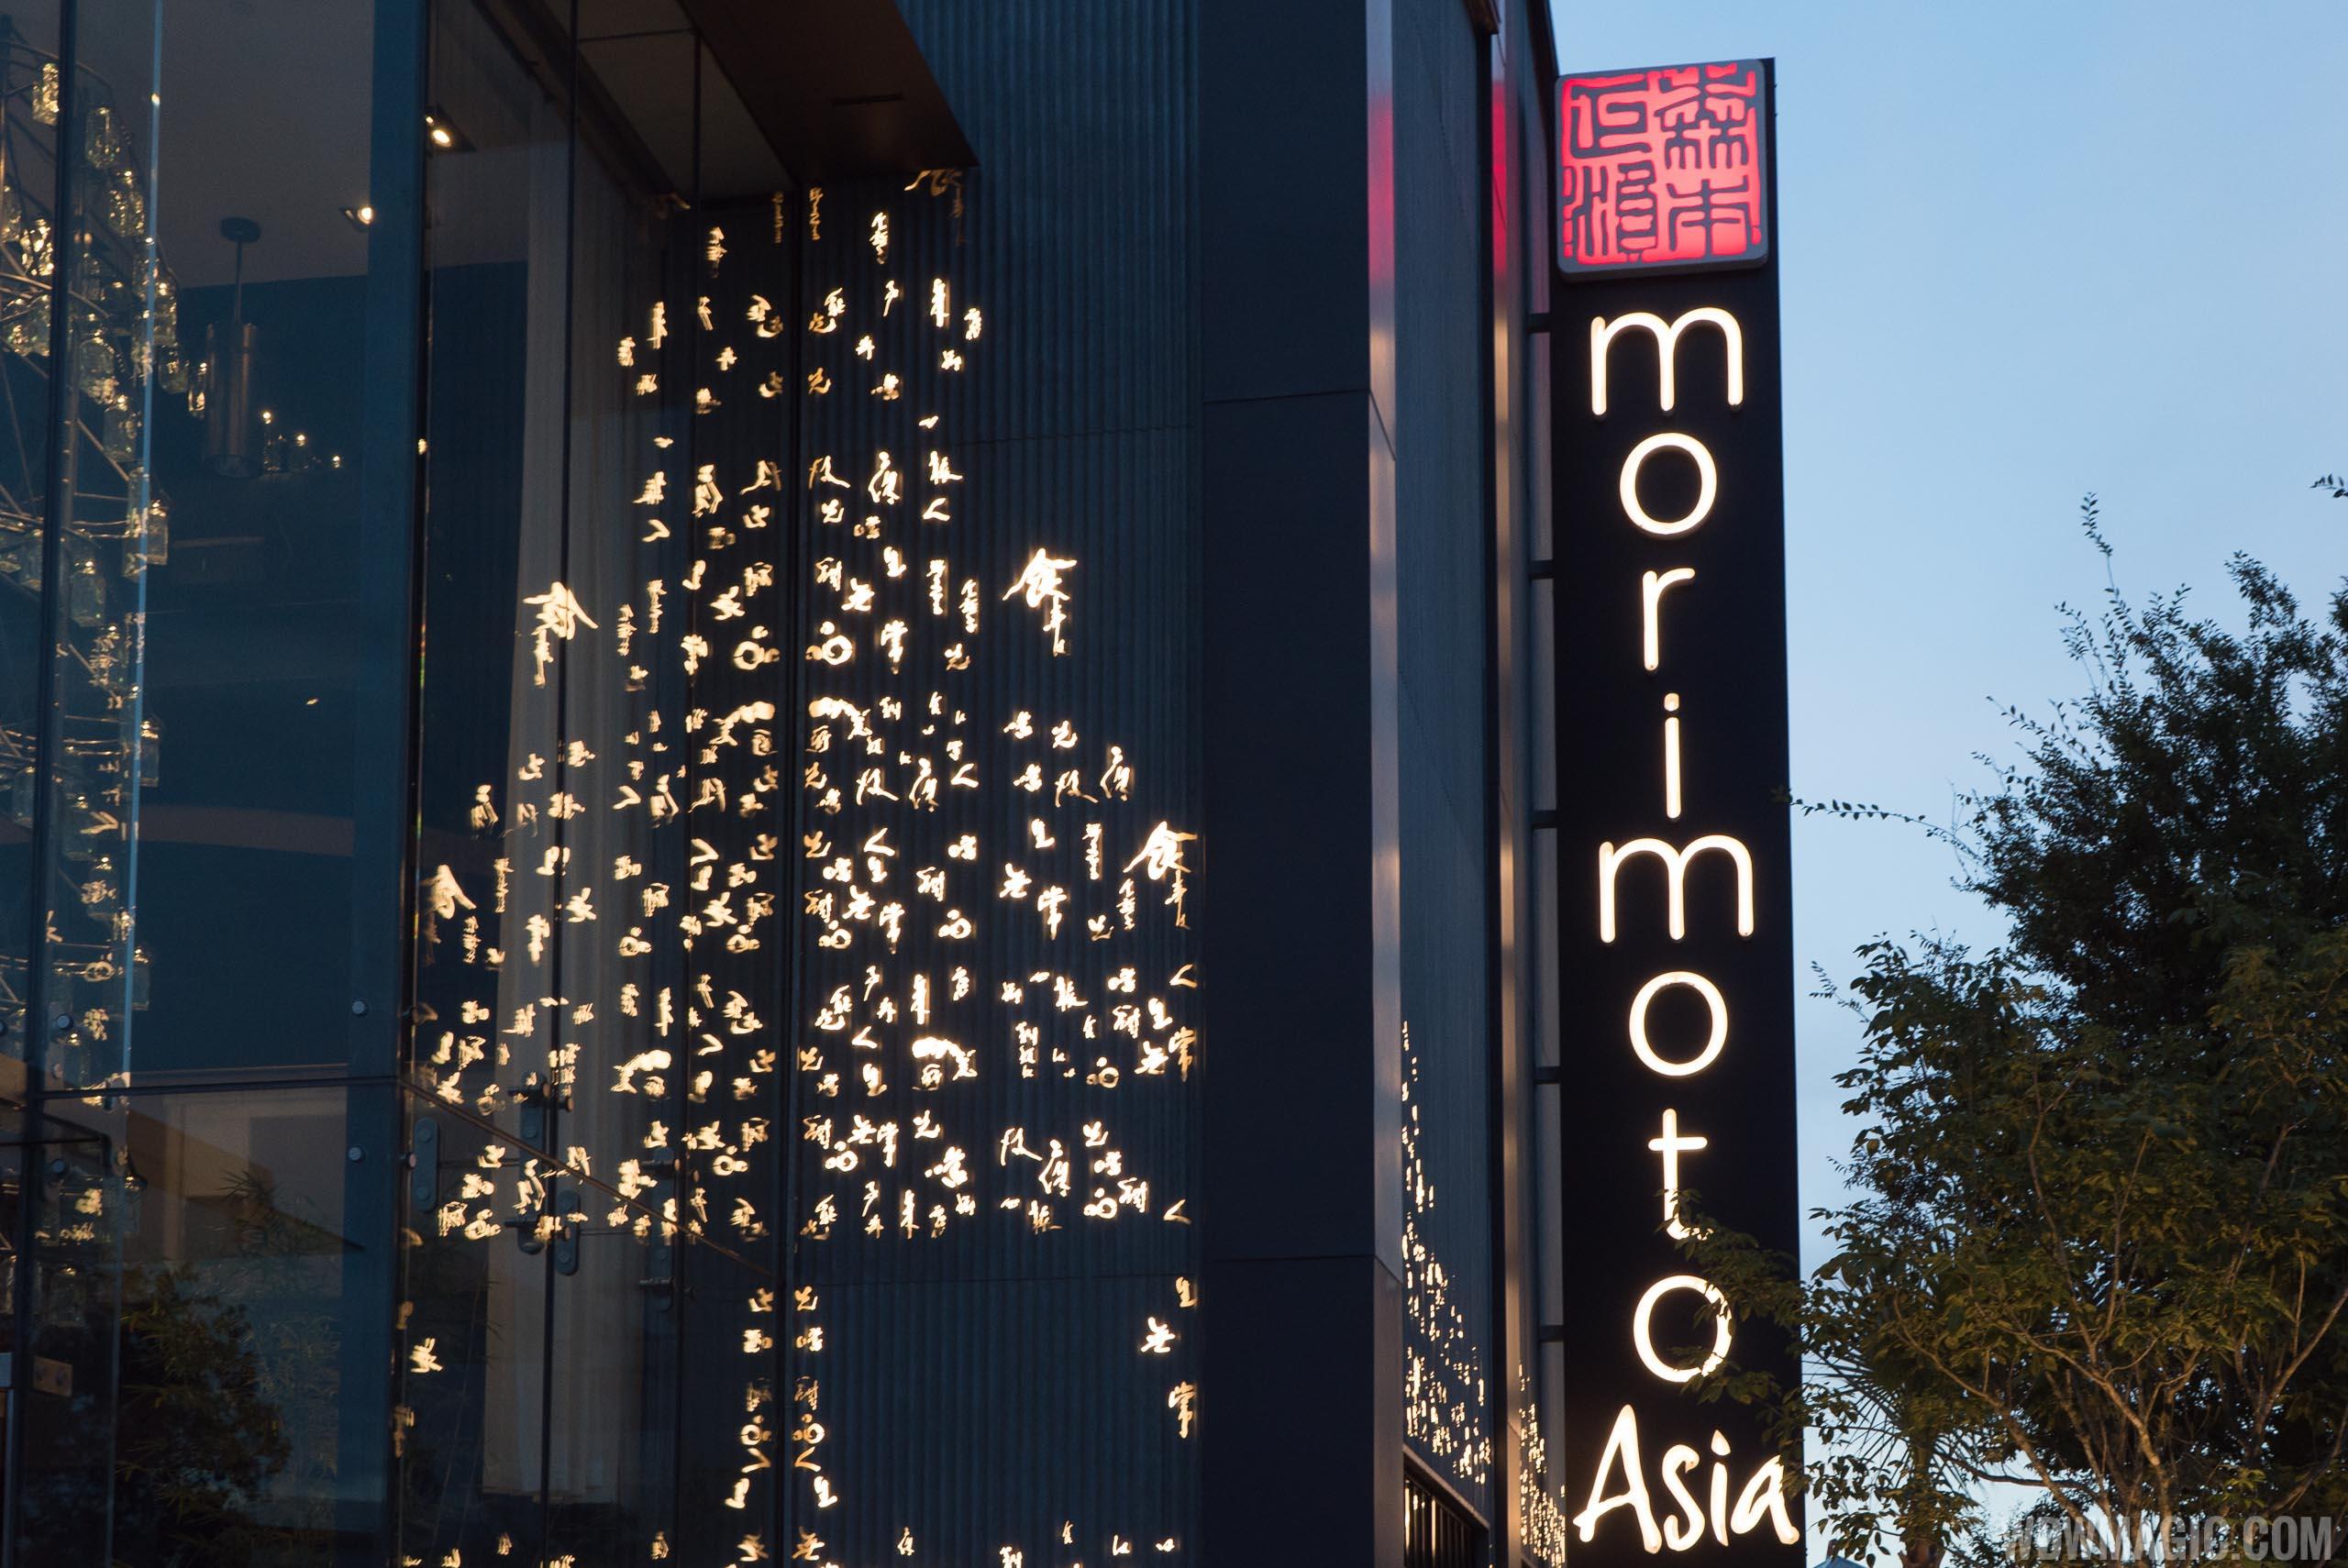 Morimoto Asia - Signage